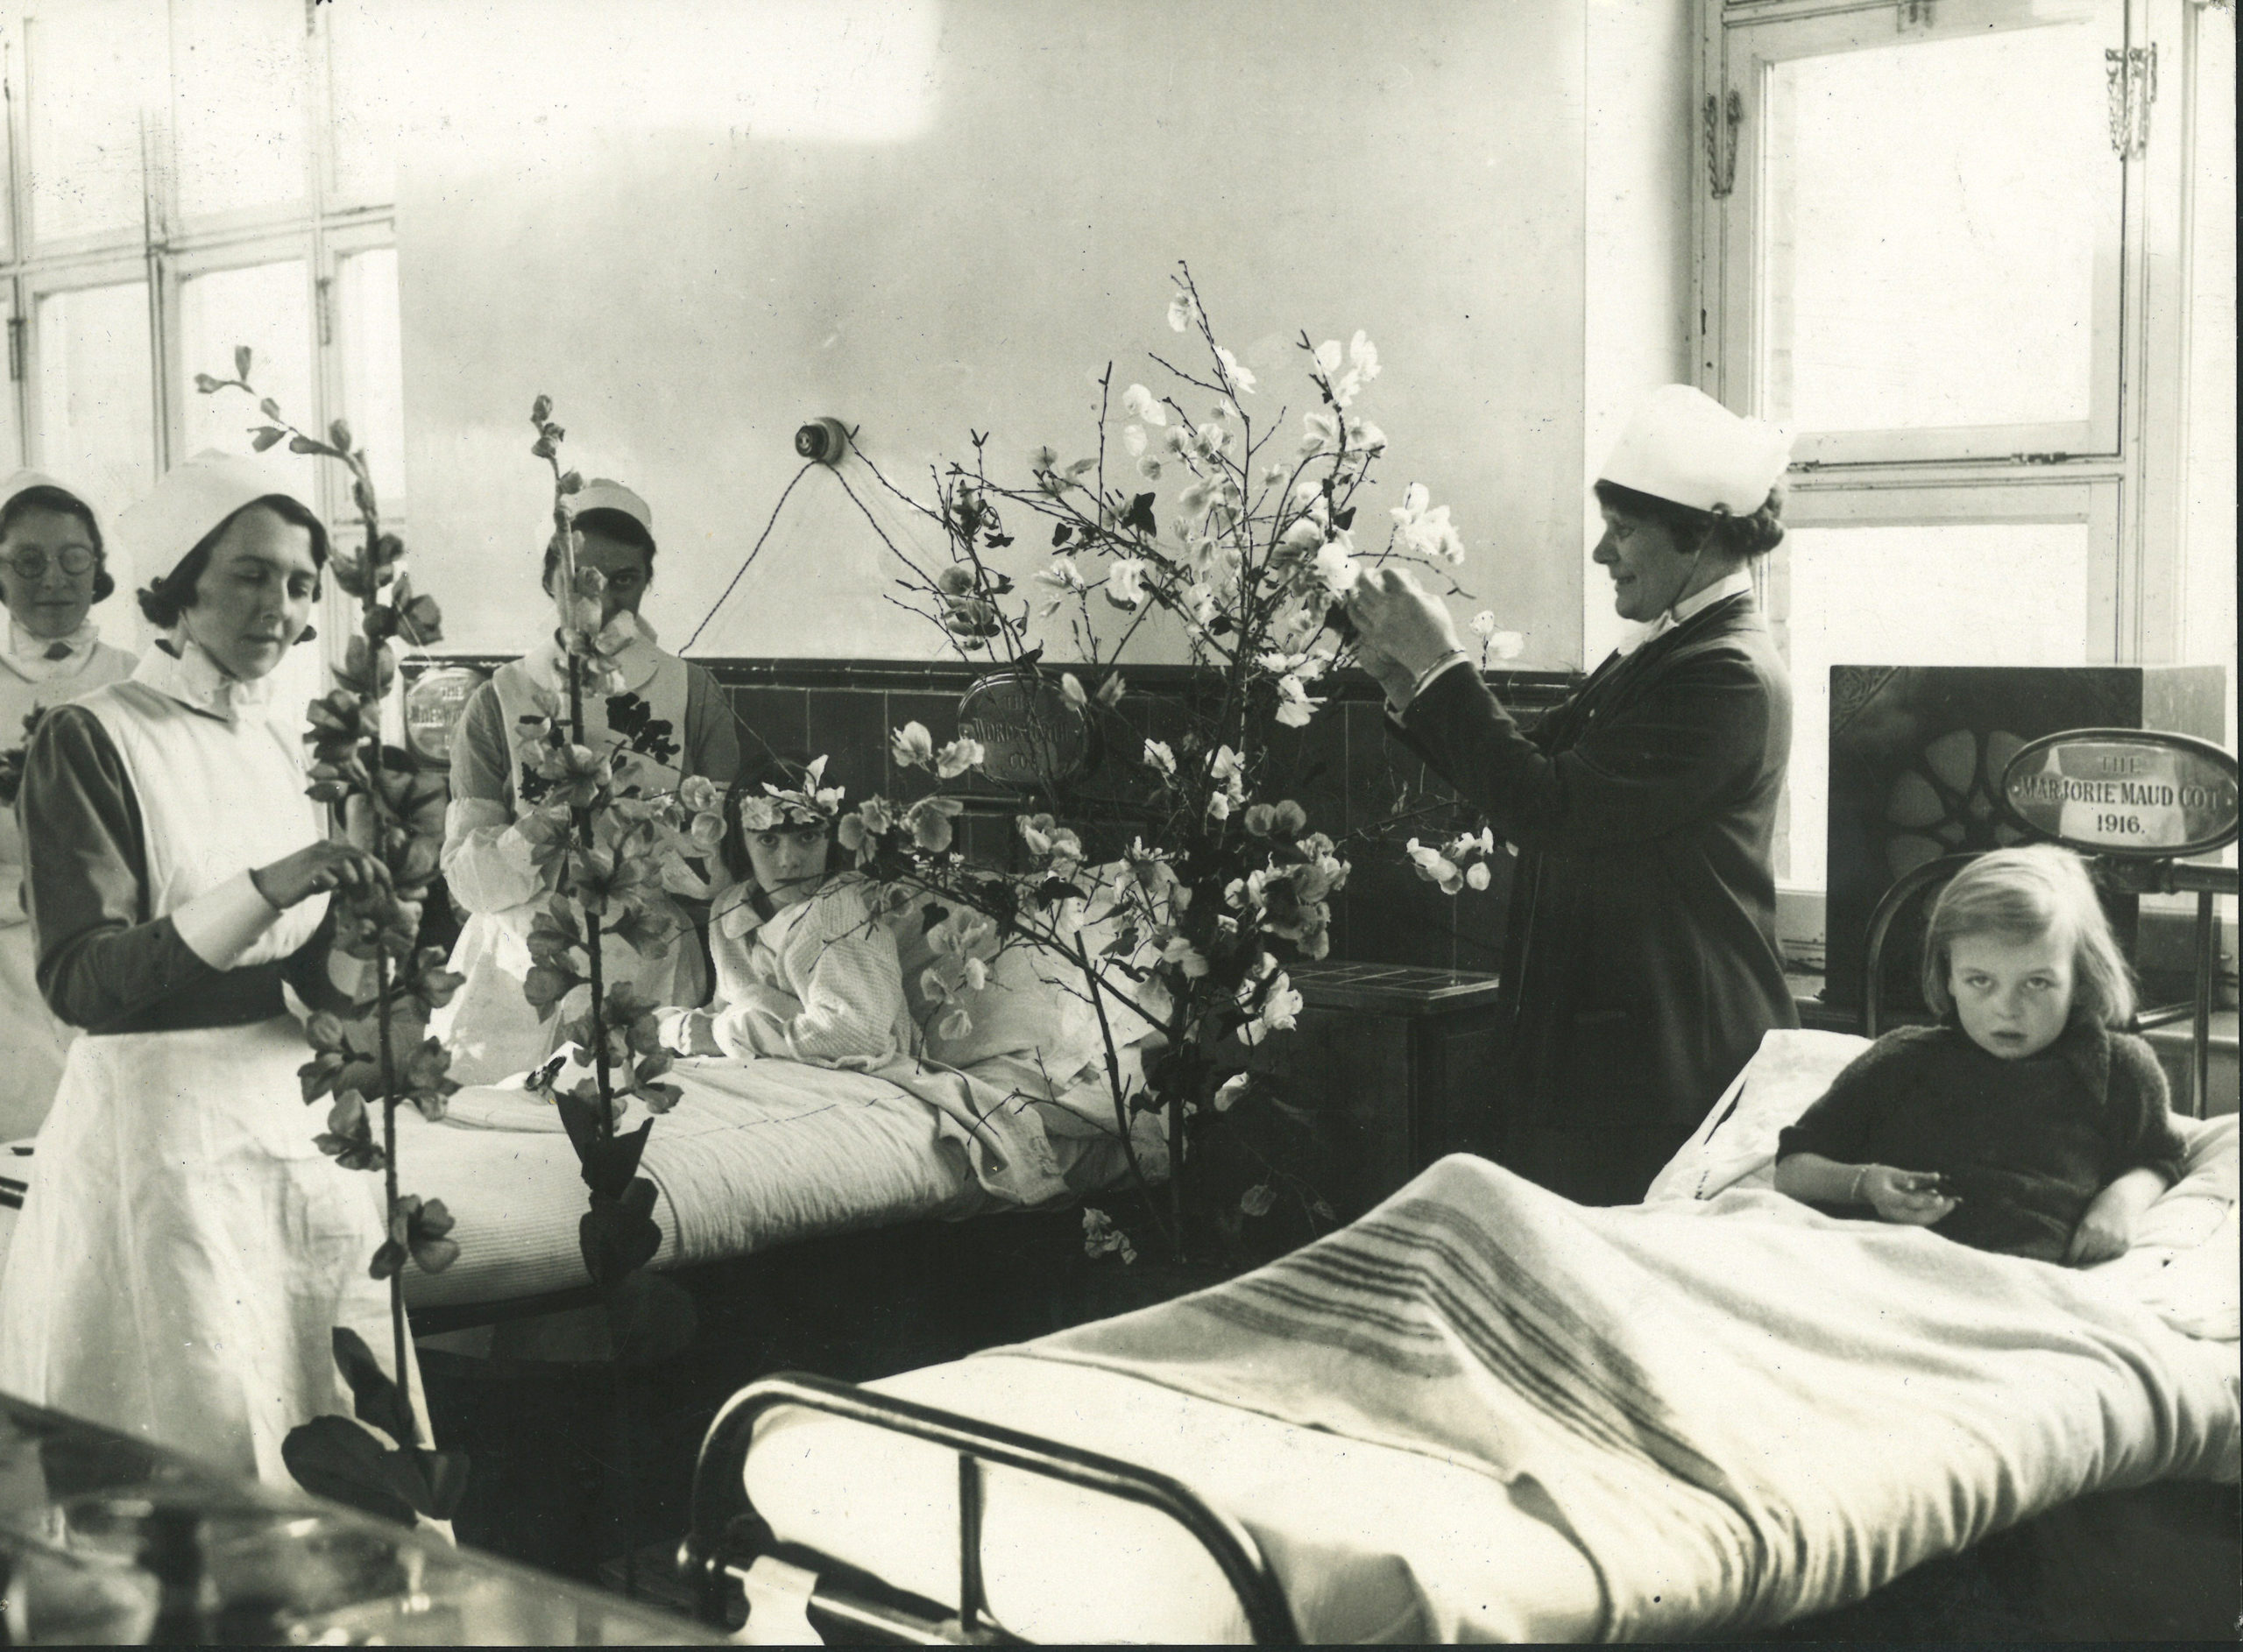 Decorating a children's ward, 1920s